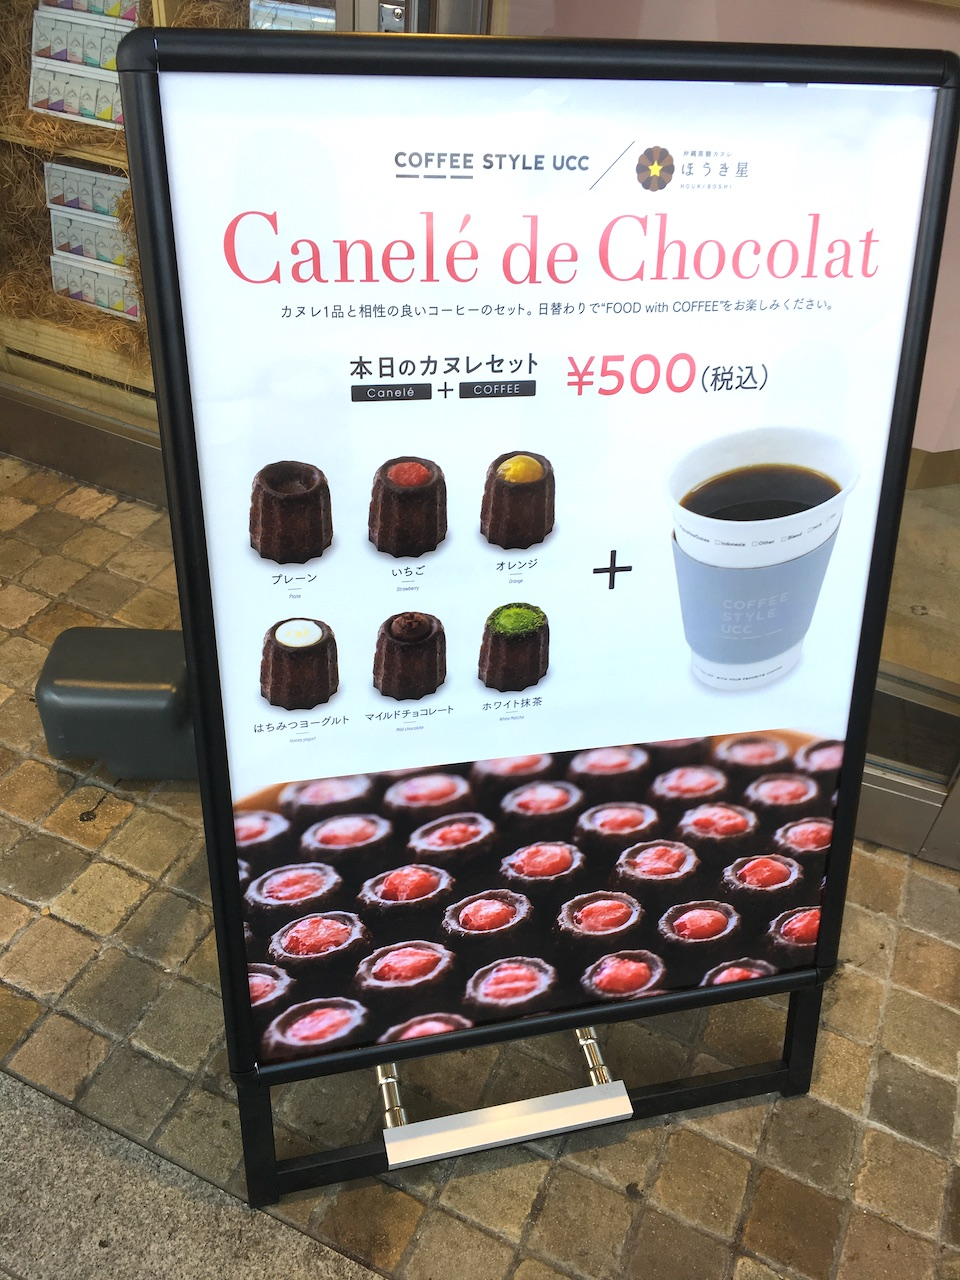 COFFEE STYLE UCC アトレ吉祥寺店 メニュー